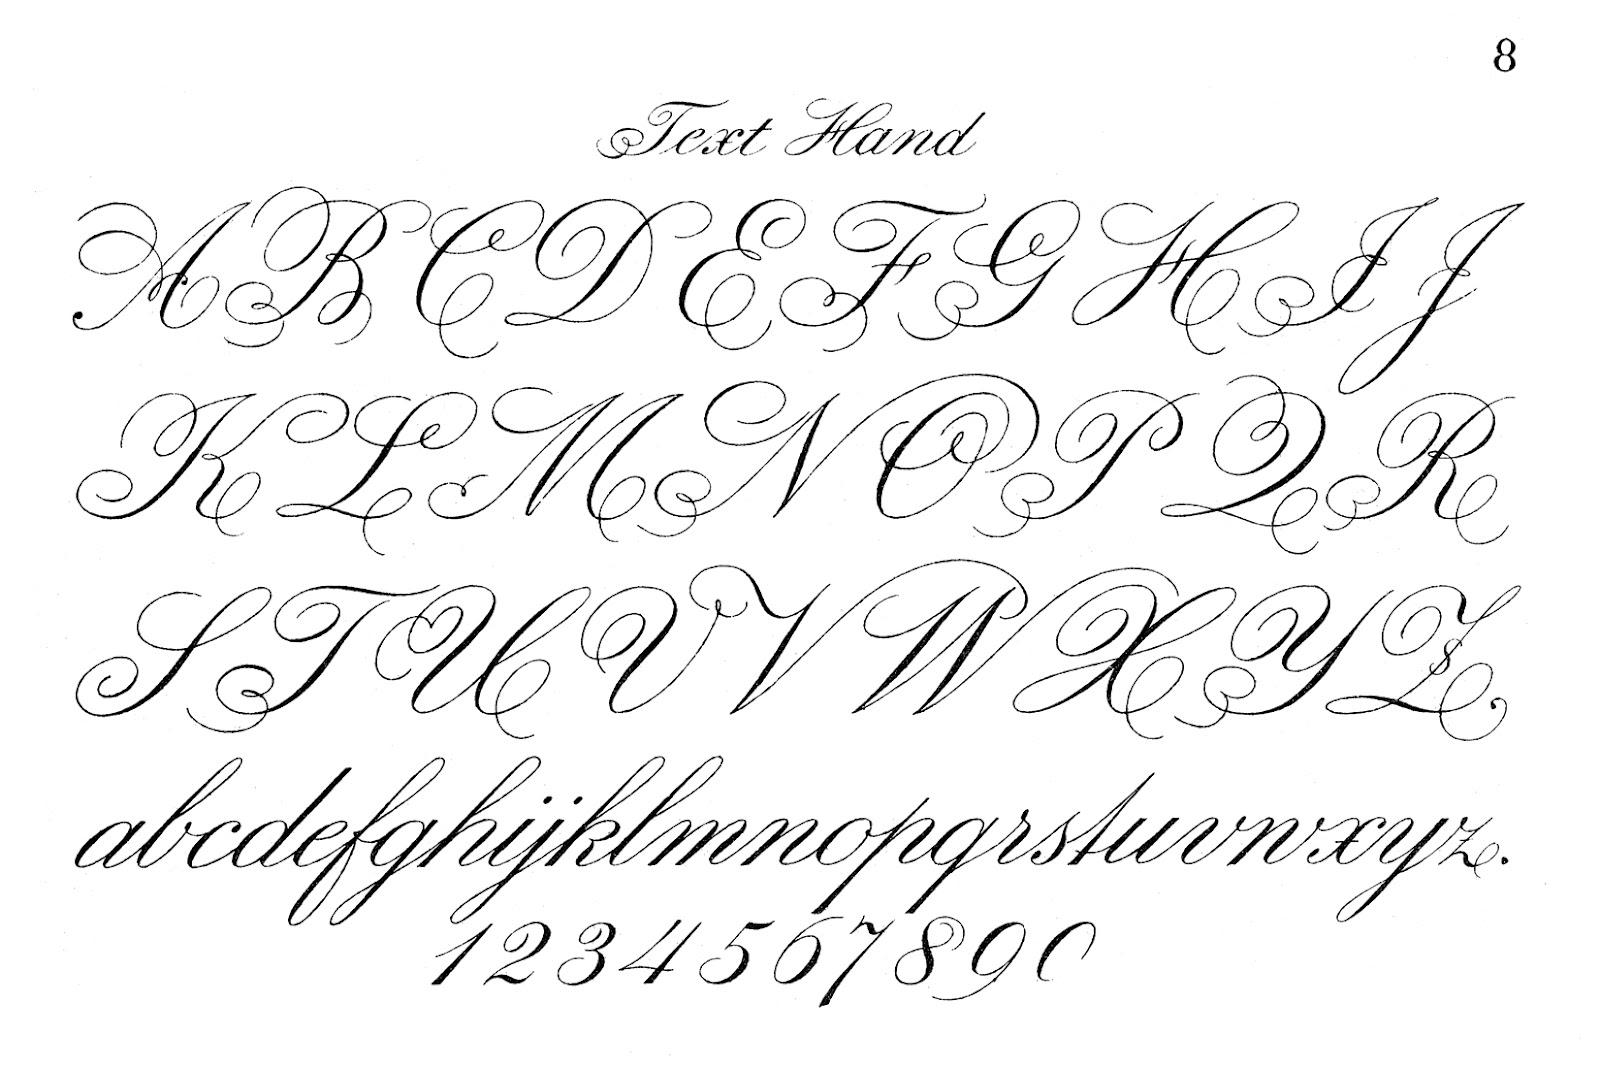 image about Fonts Printable named 13 Extravagant Font Letters Script R Visuals - Printable Cursive